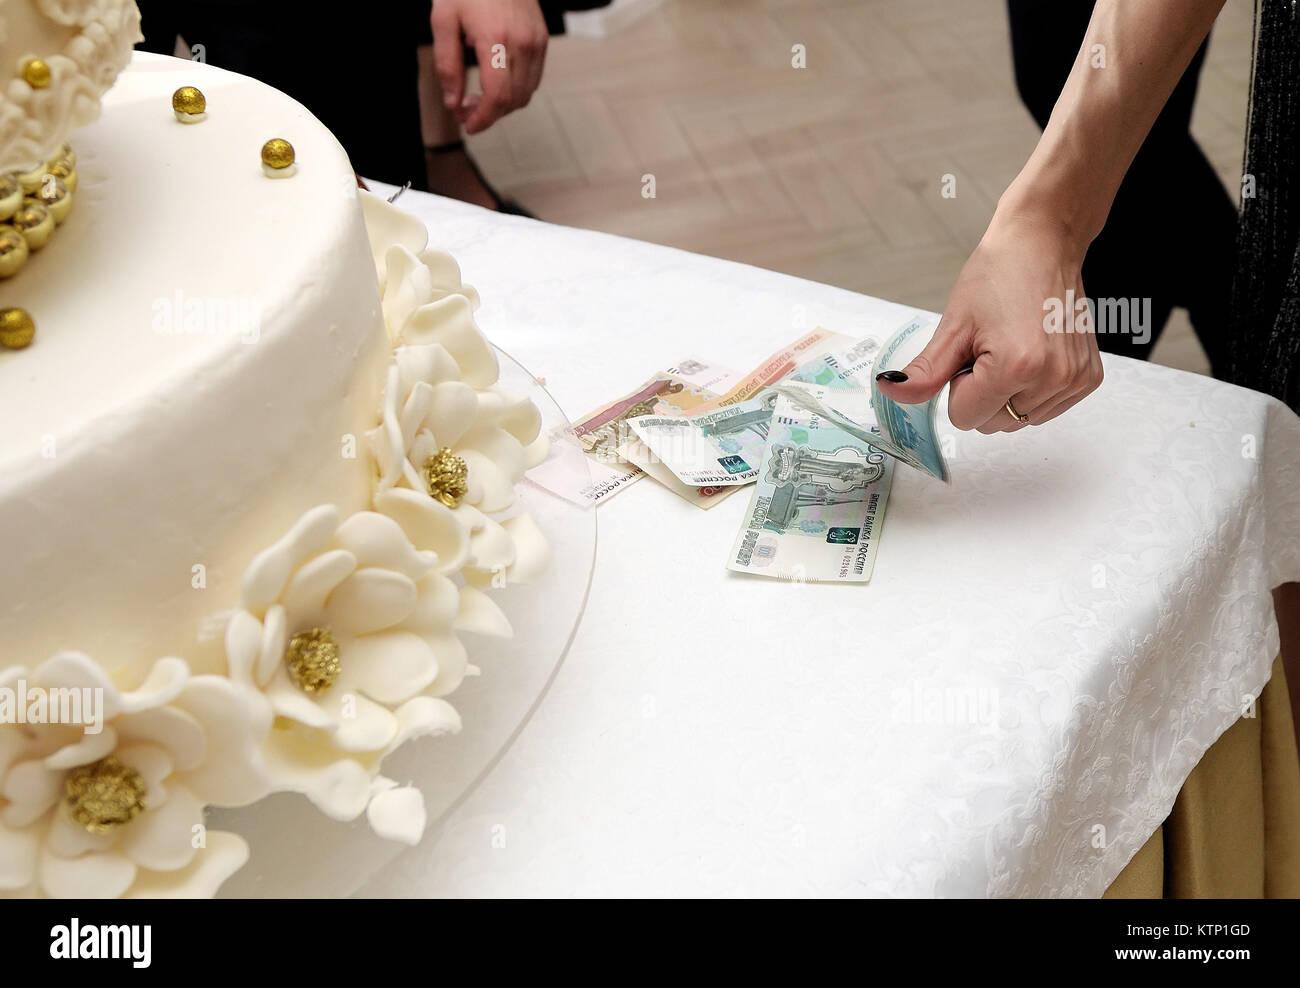 Russian Wedding Cake Stock Photos & Russian Wedding Cake Stock ...